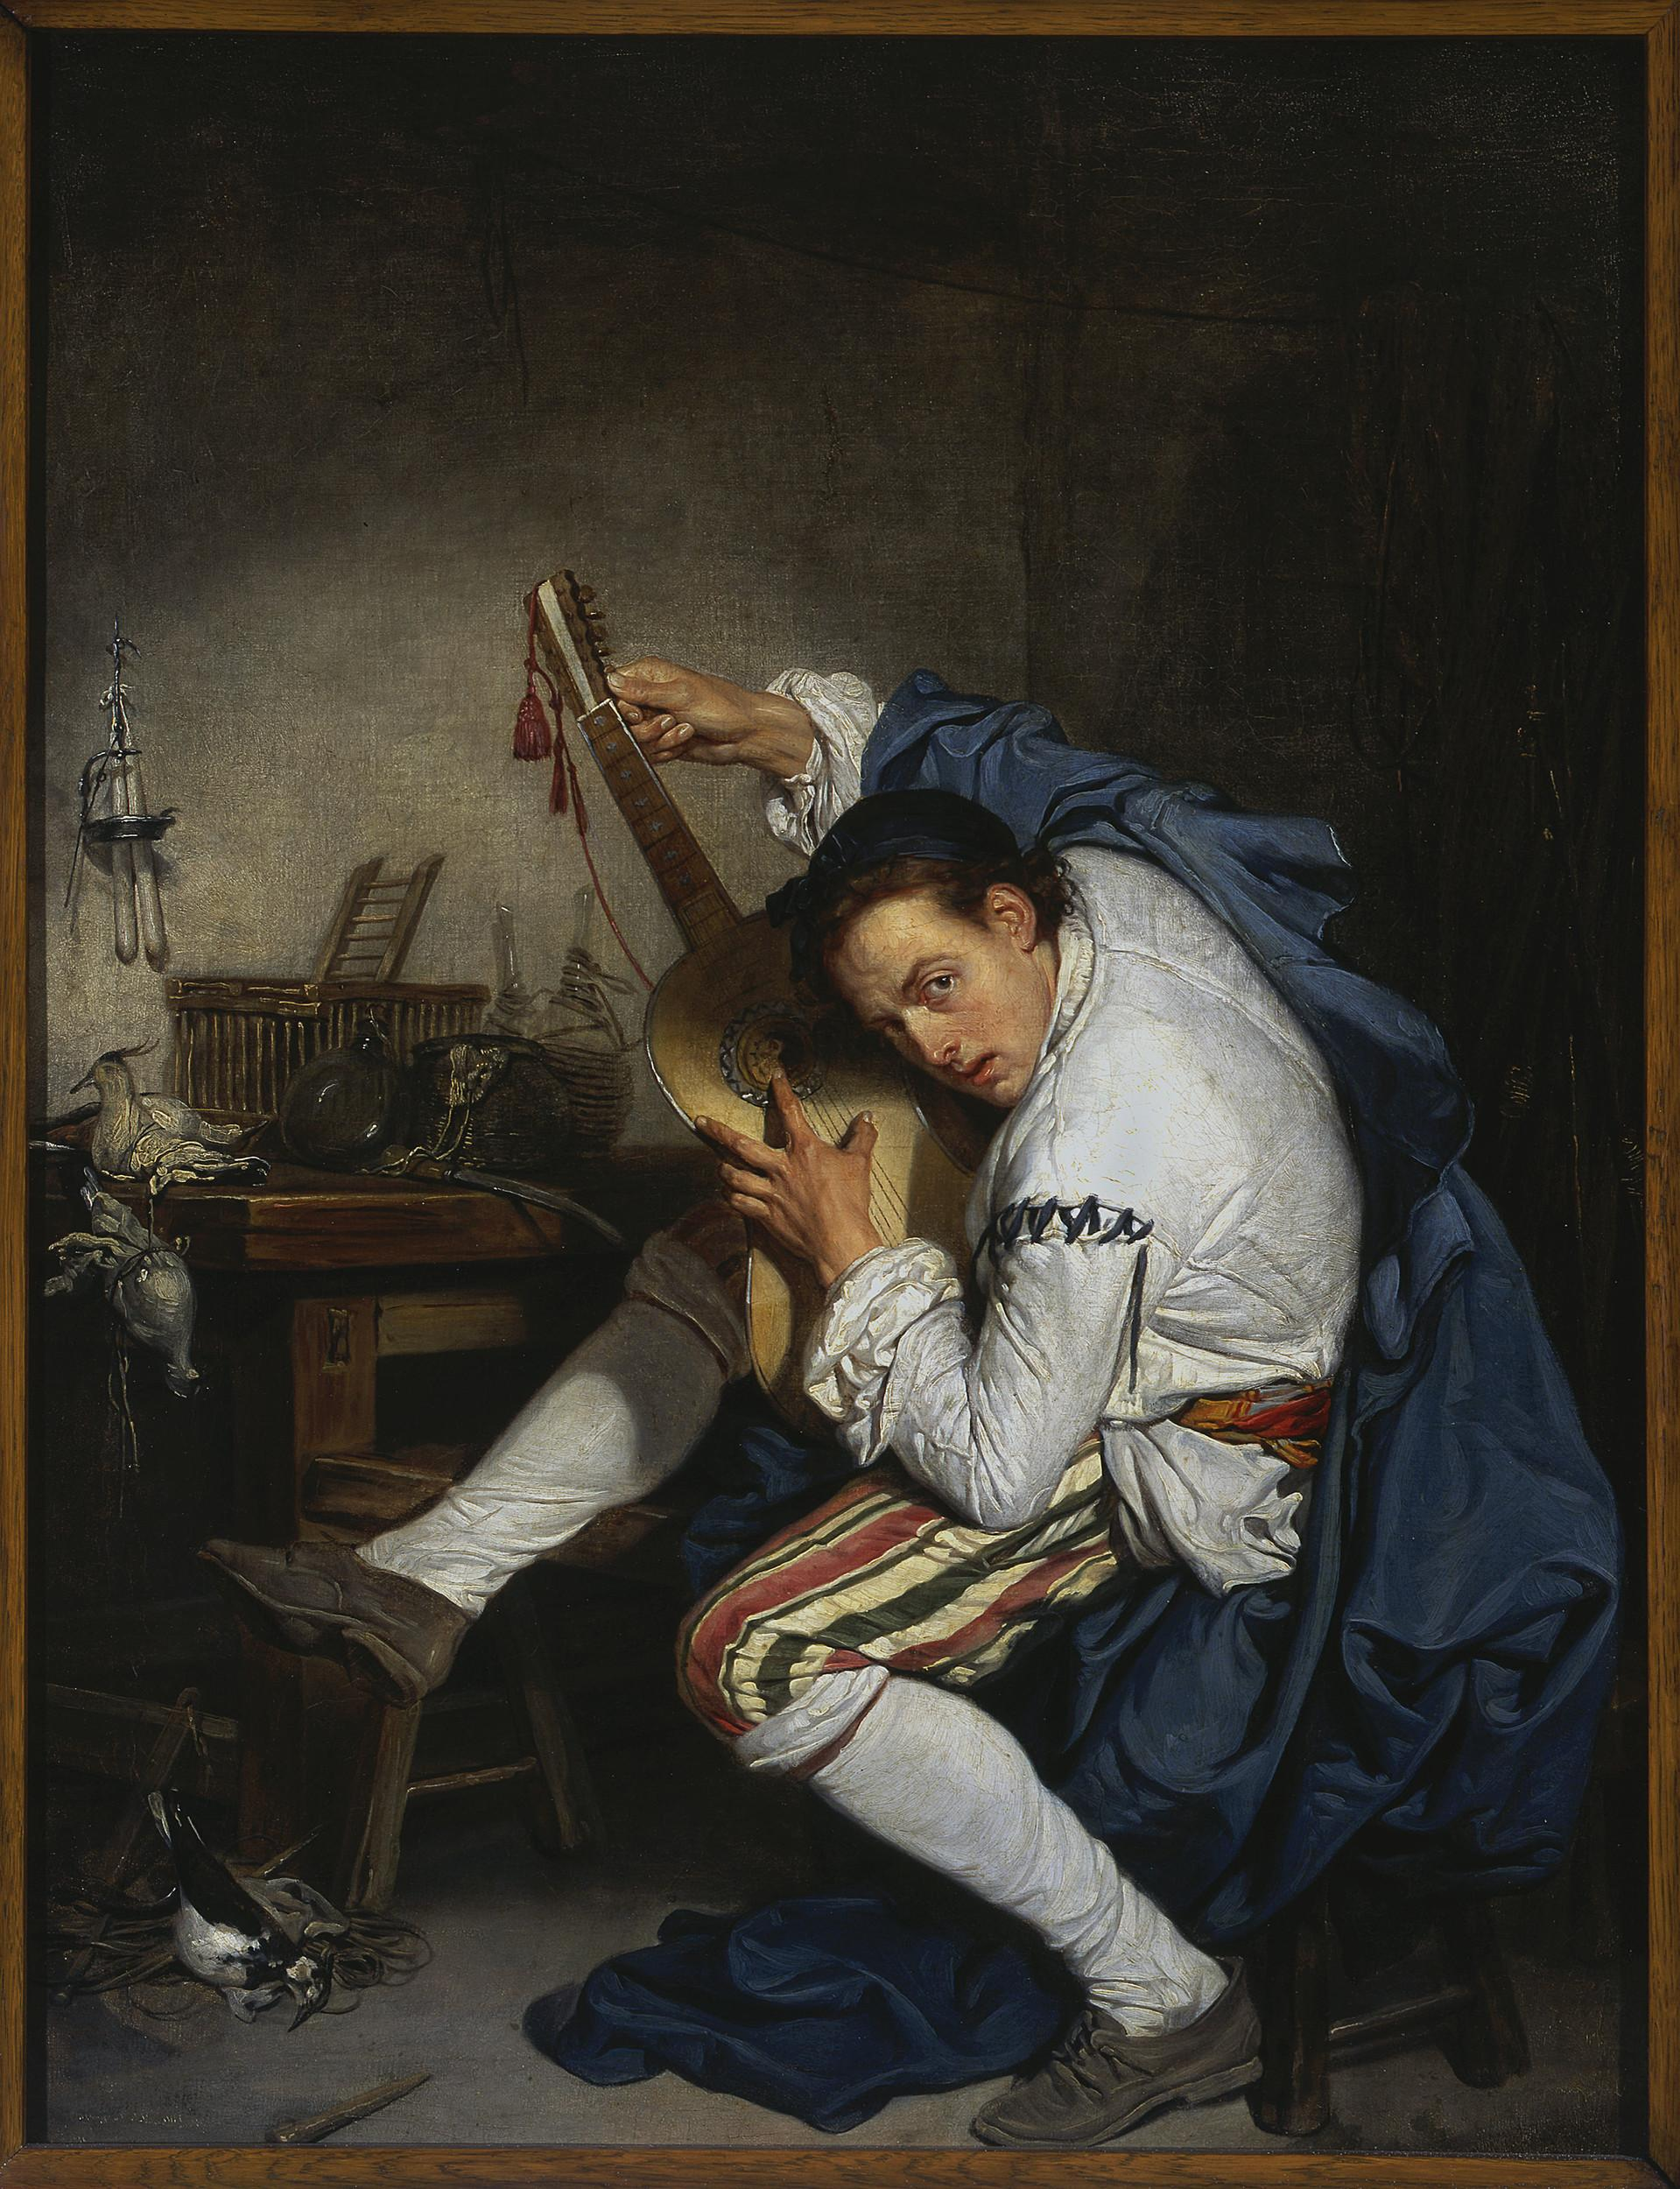 Fichier:Jean-Baptiste Greuze, Gitarzysta.jpg